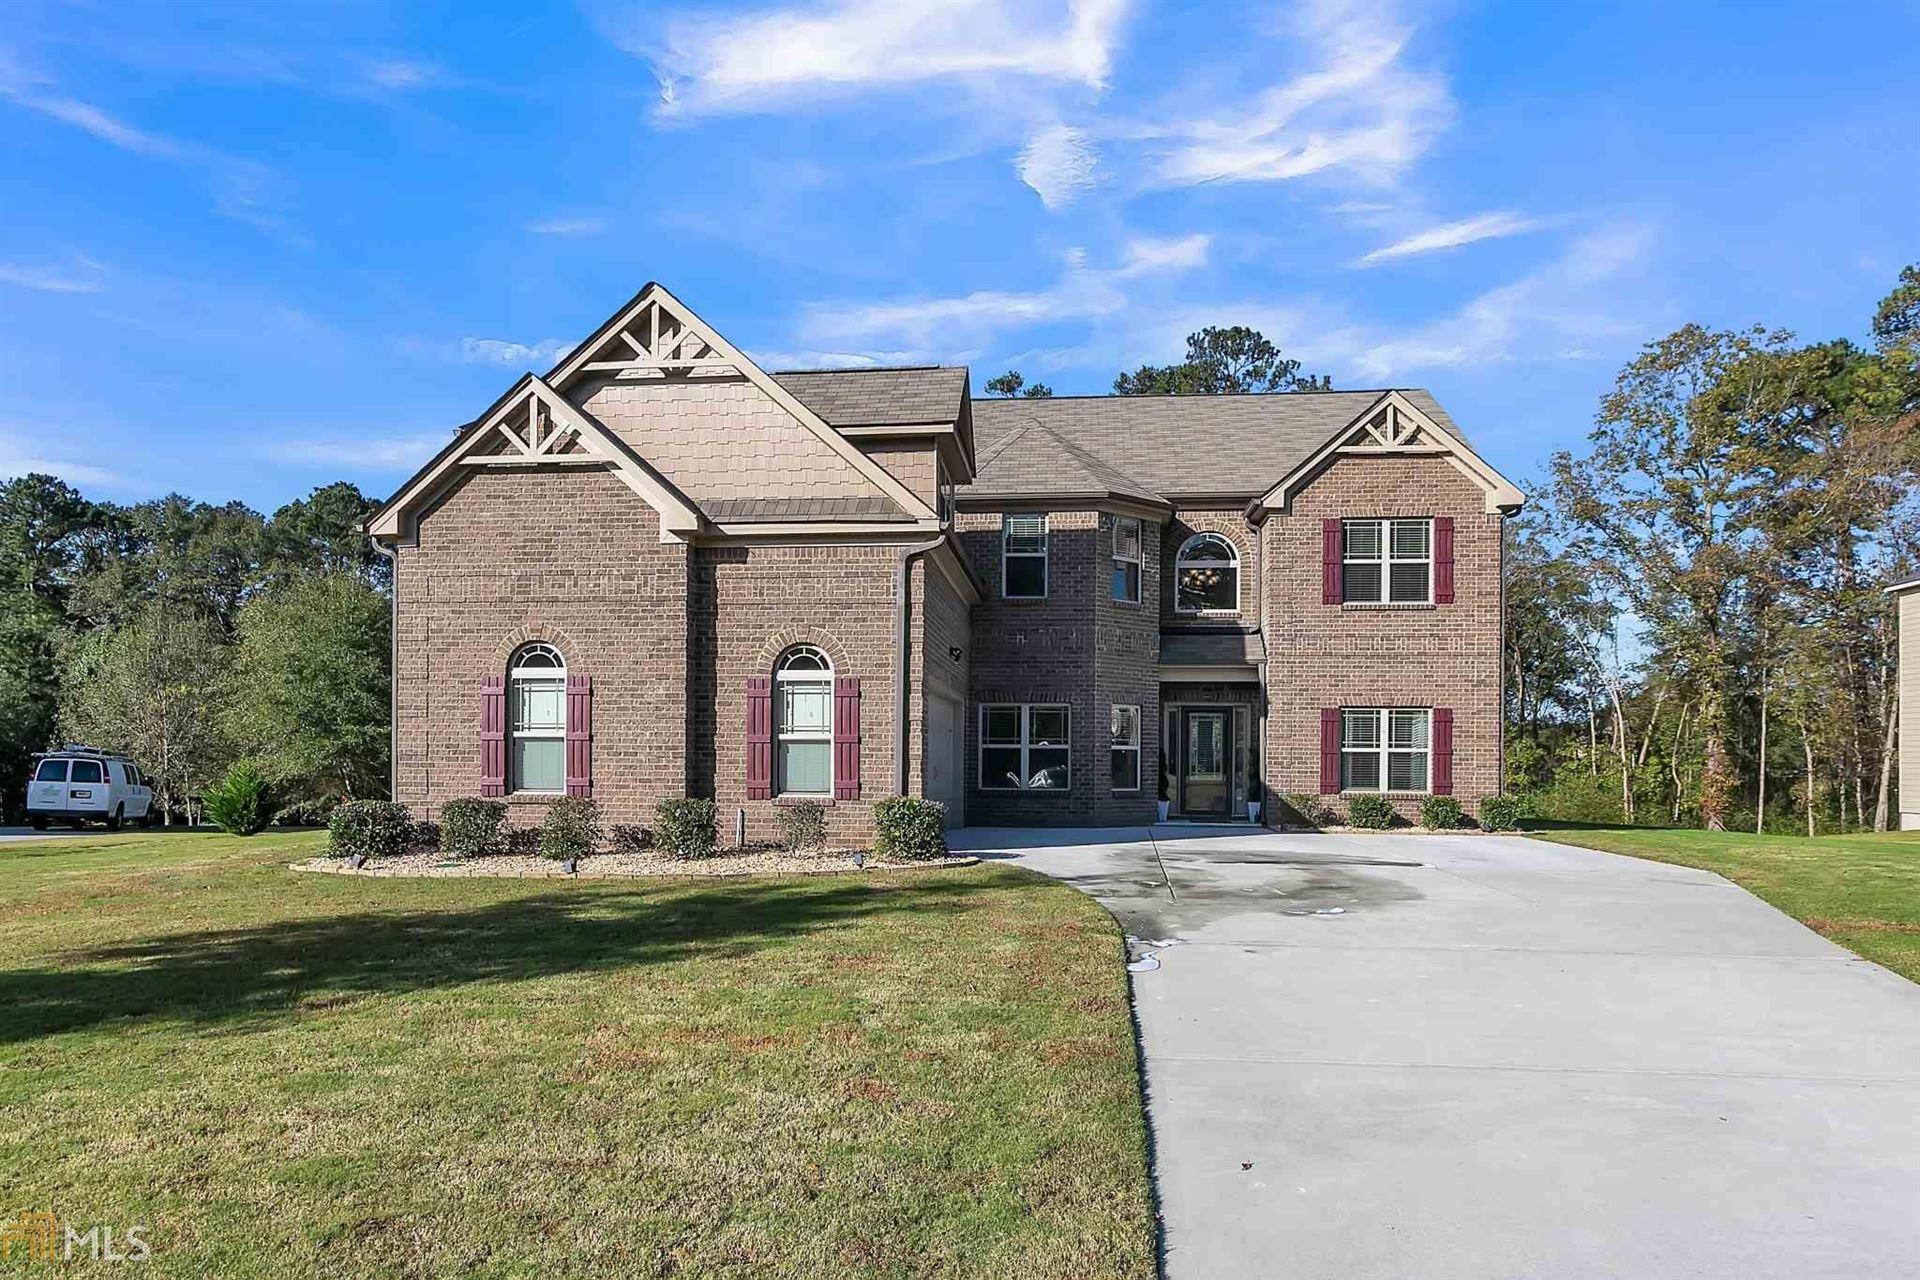 175 Broadwater Dr, Fayetteville, GA 30214 - #: 8908288